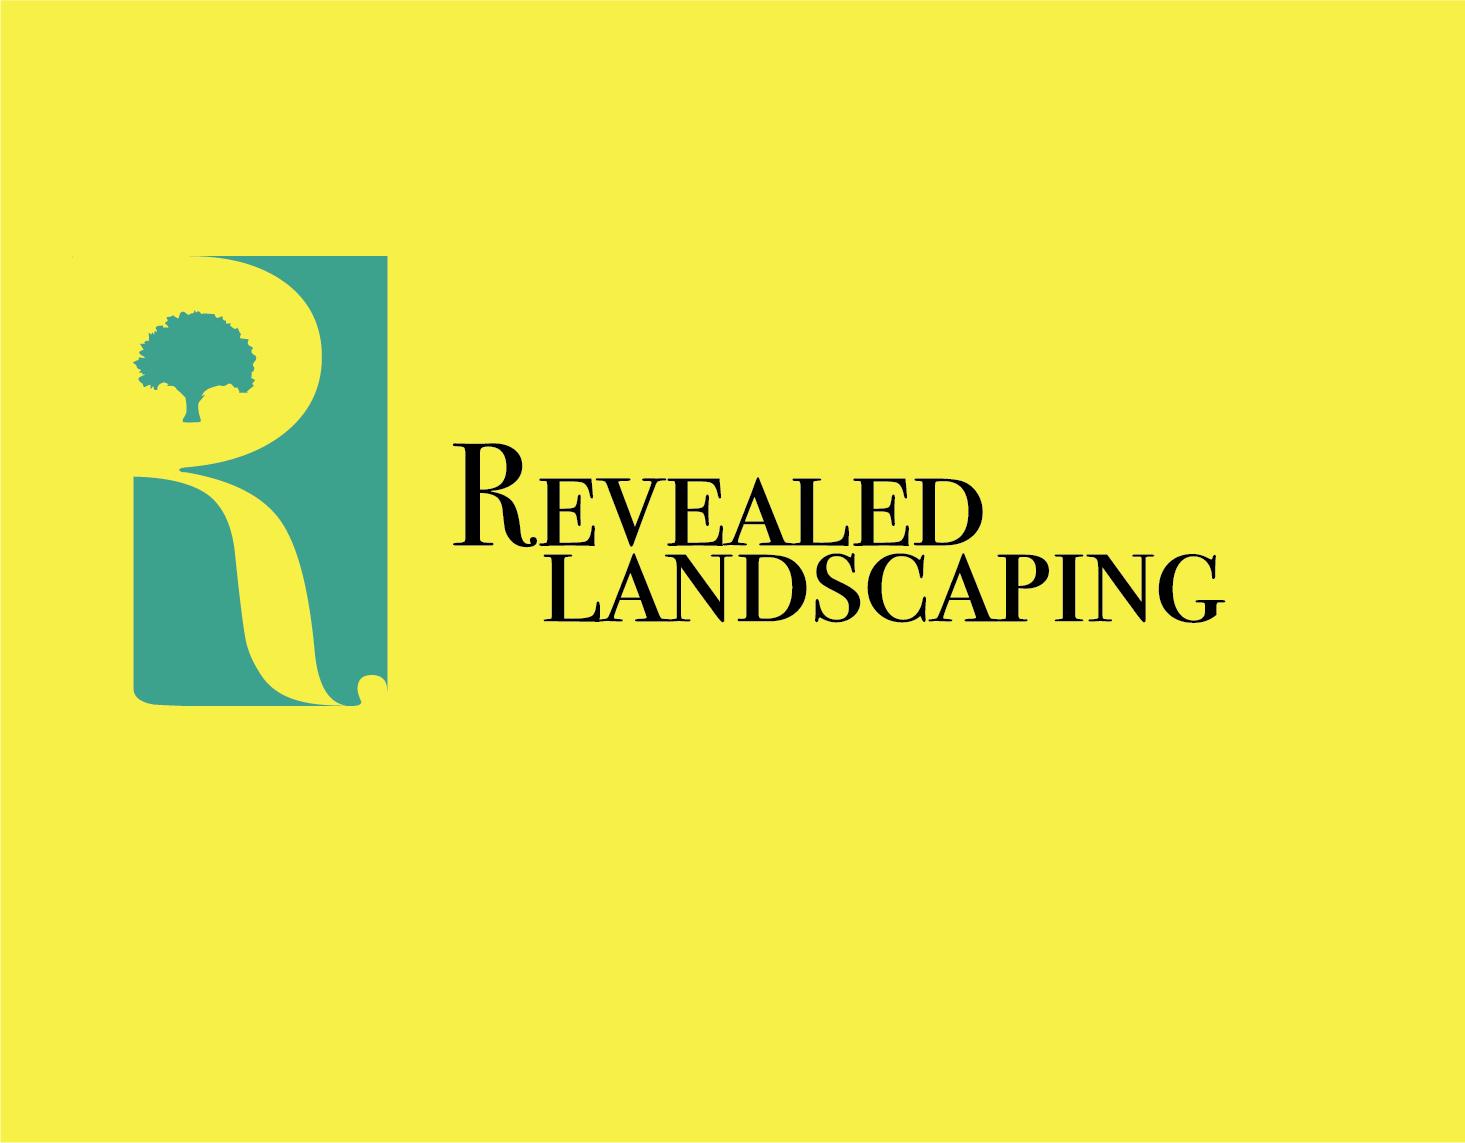 Bold, Professional, Landscaping Logo Design for Revealed.